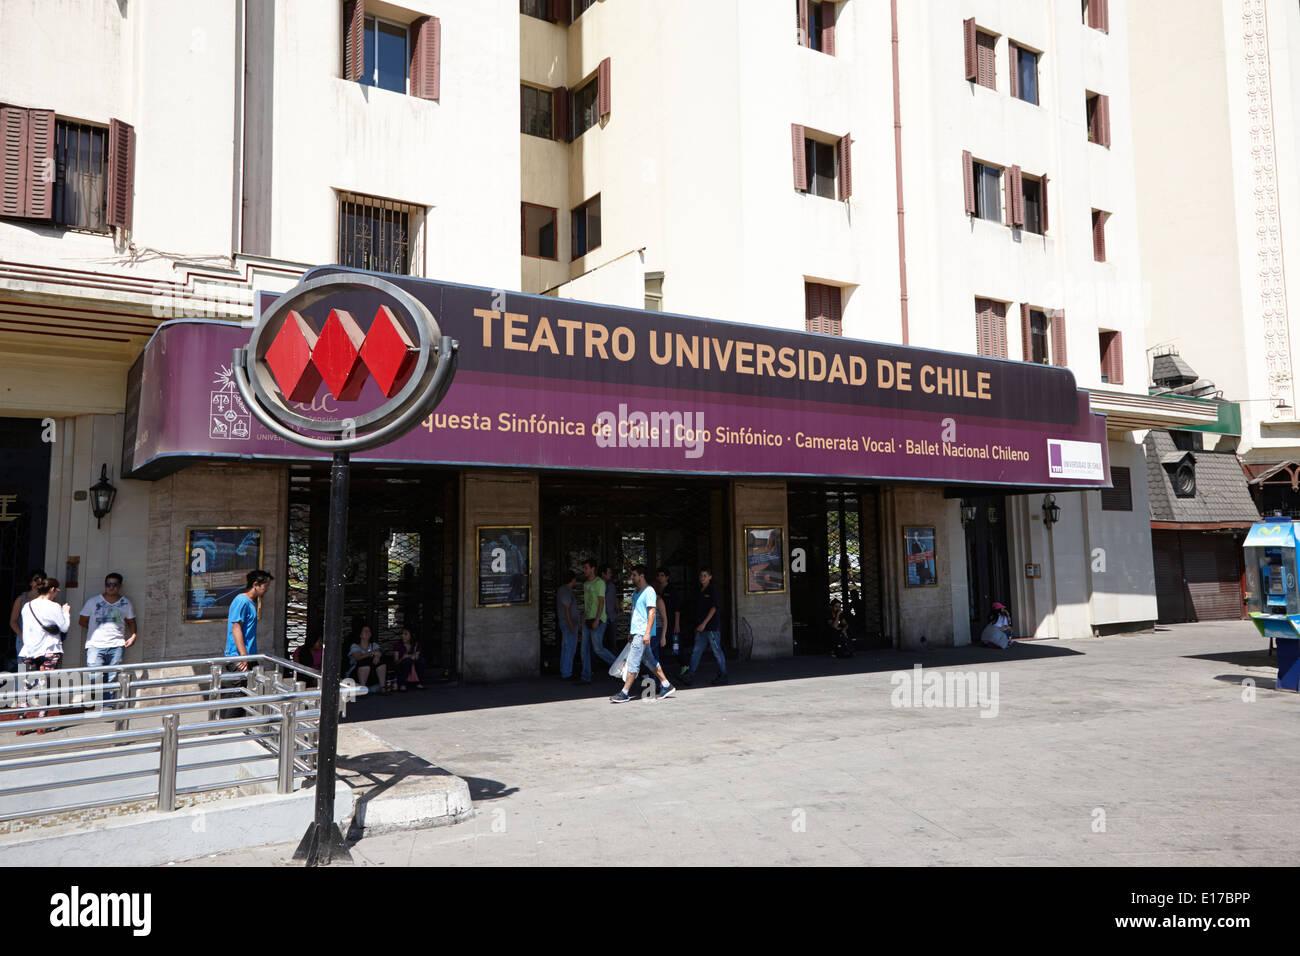 teatro universidad de chile Santiago Chile - Stock Image